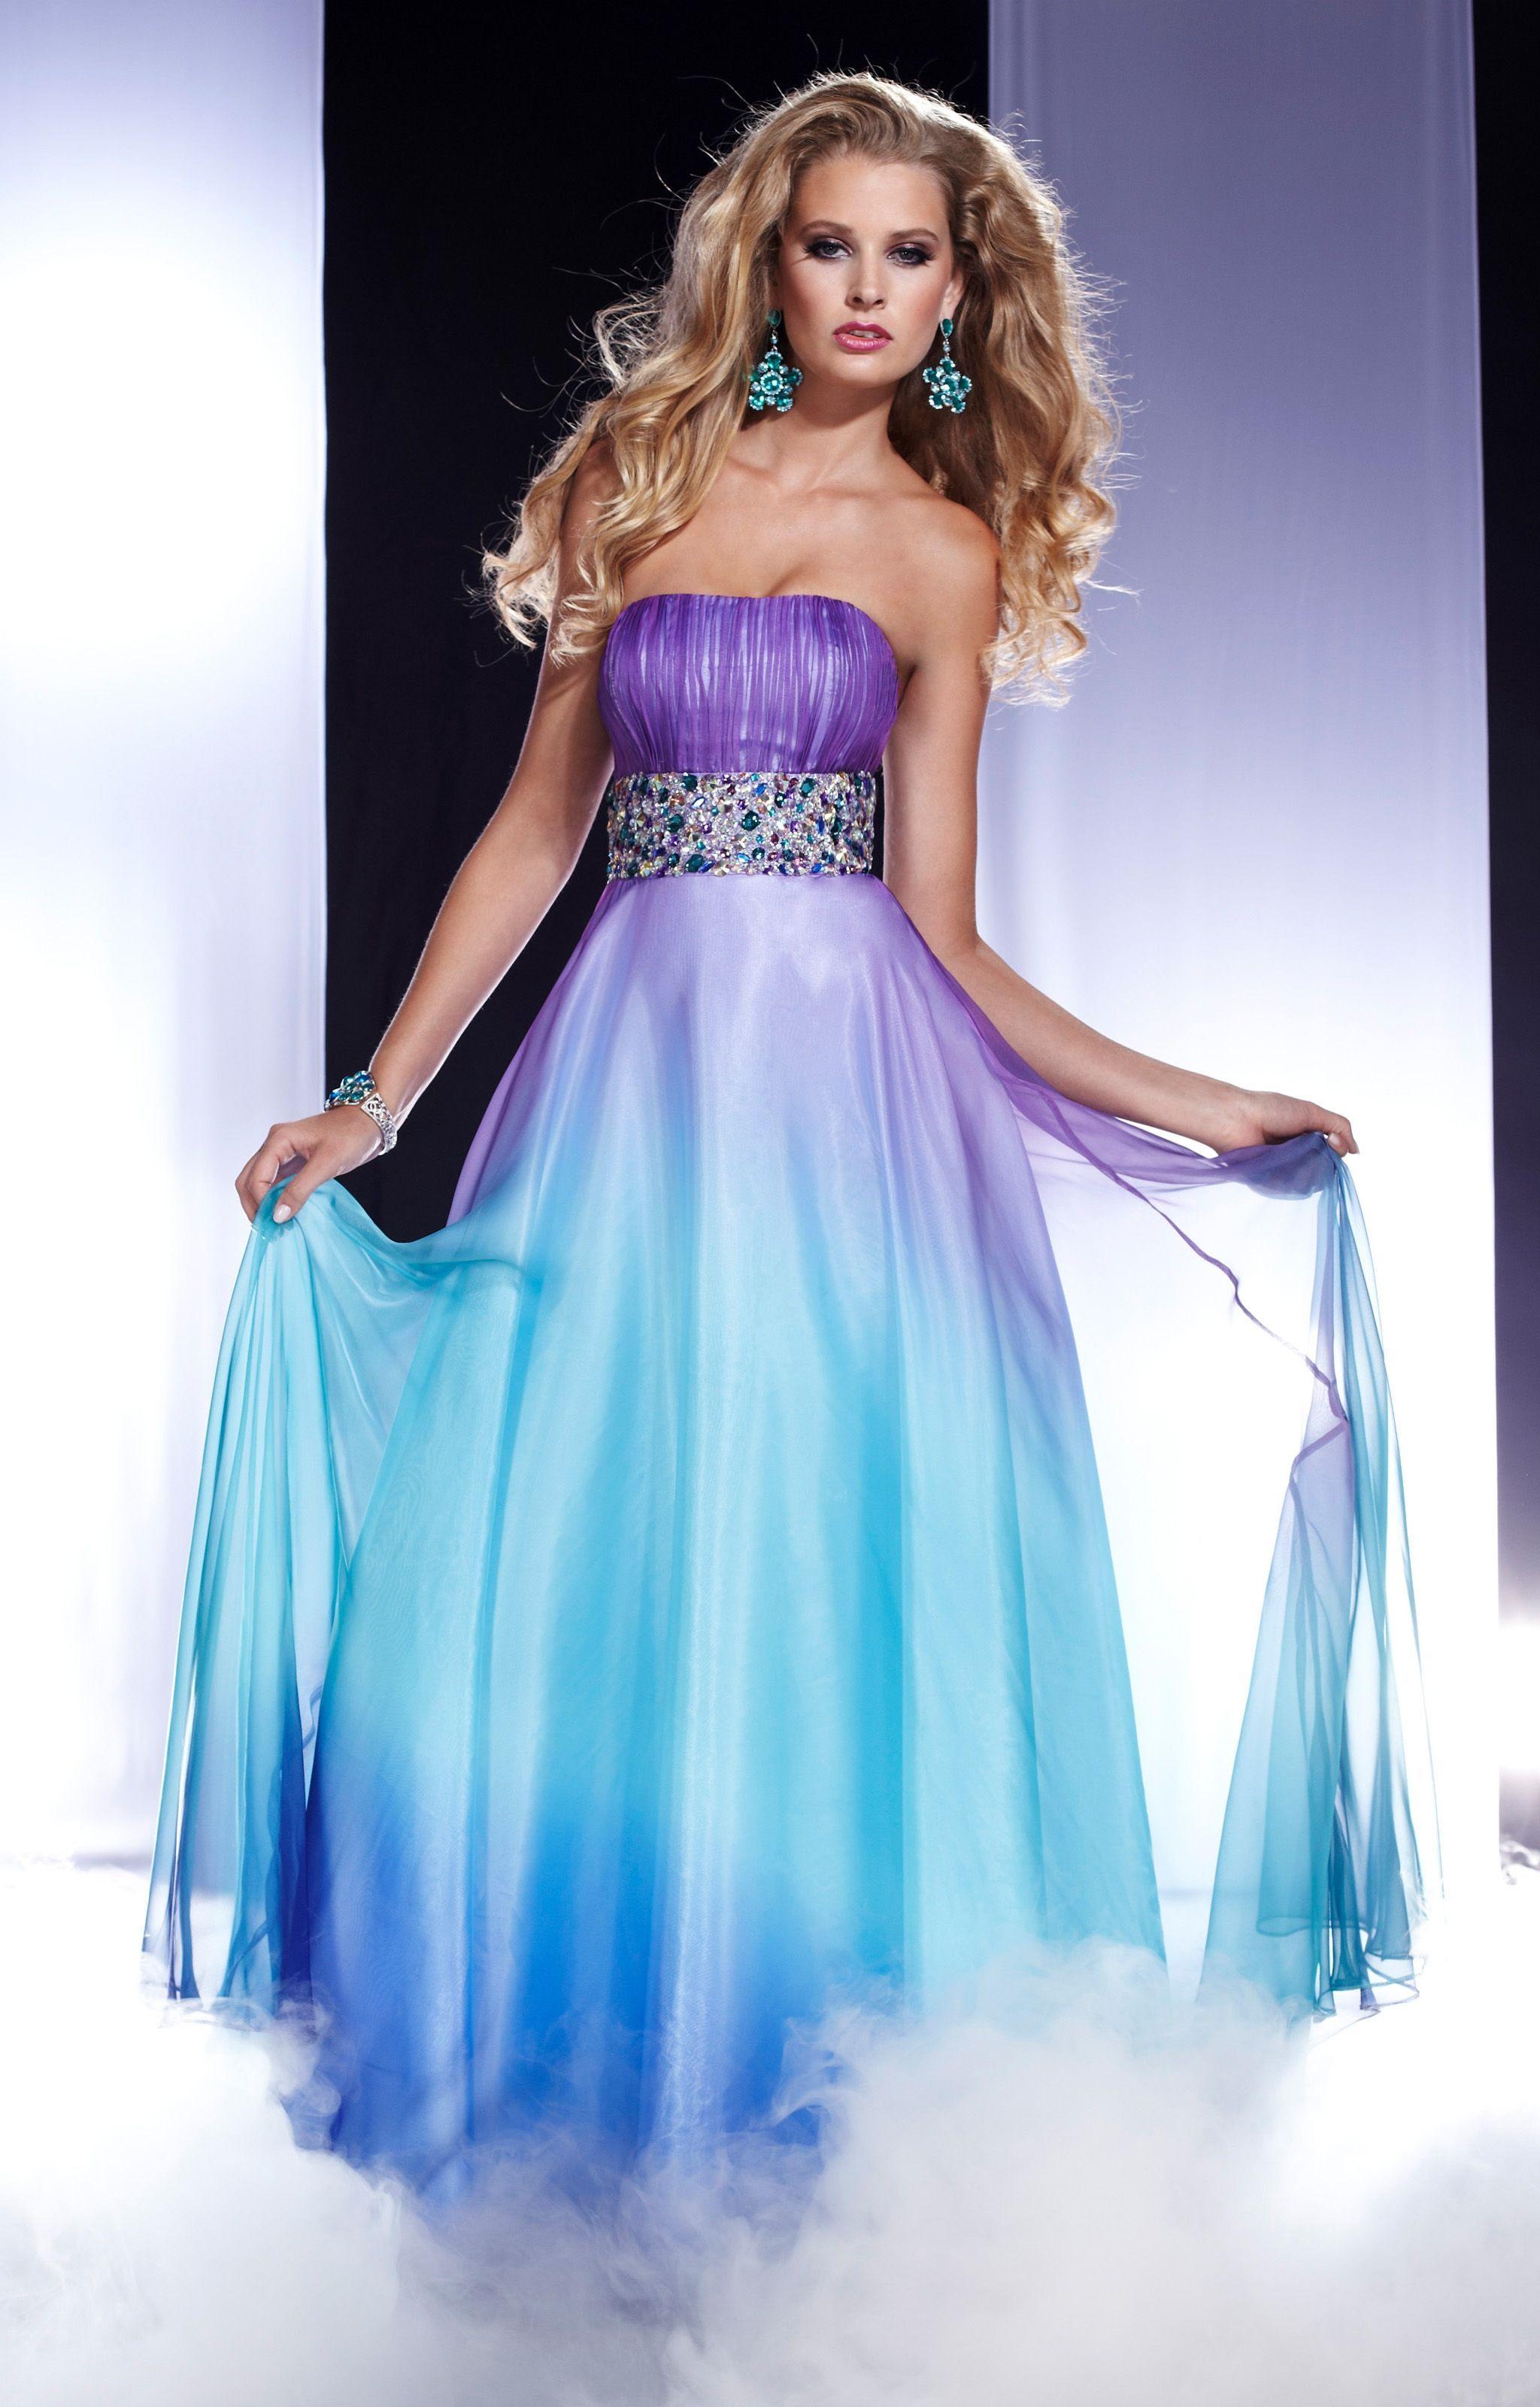 Long Strapless Prom Dresses 2013